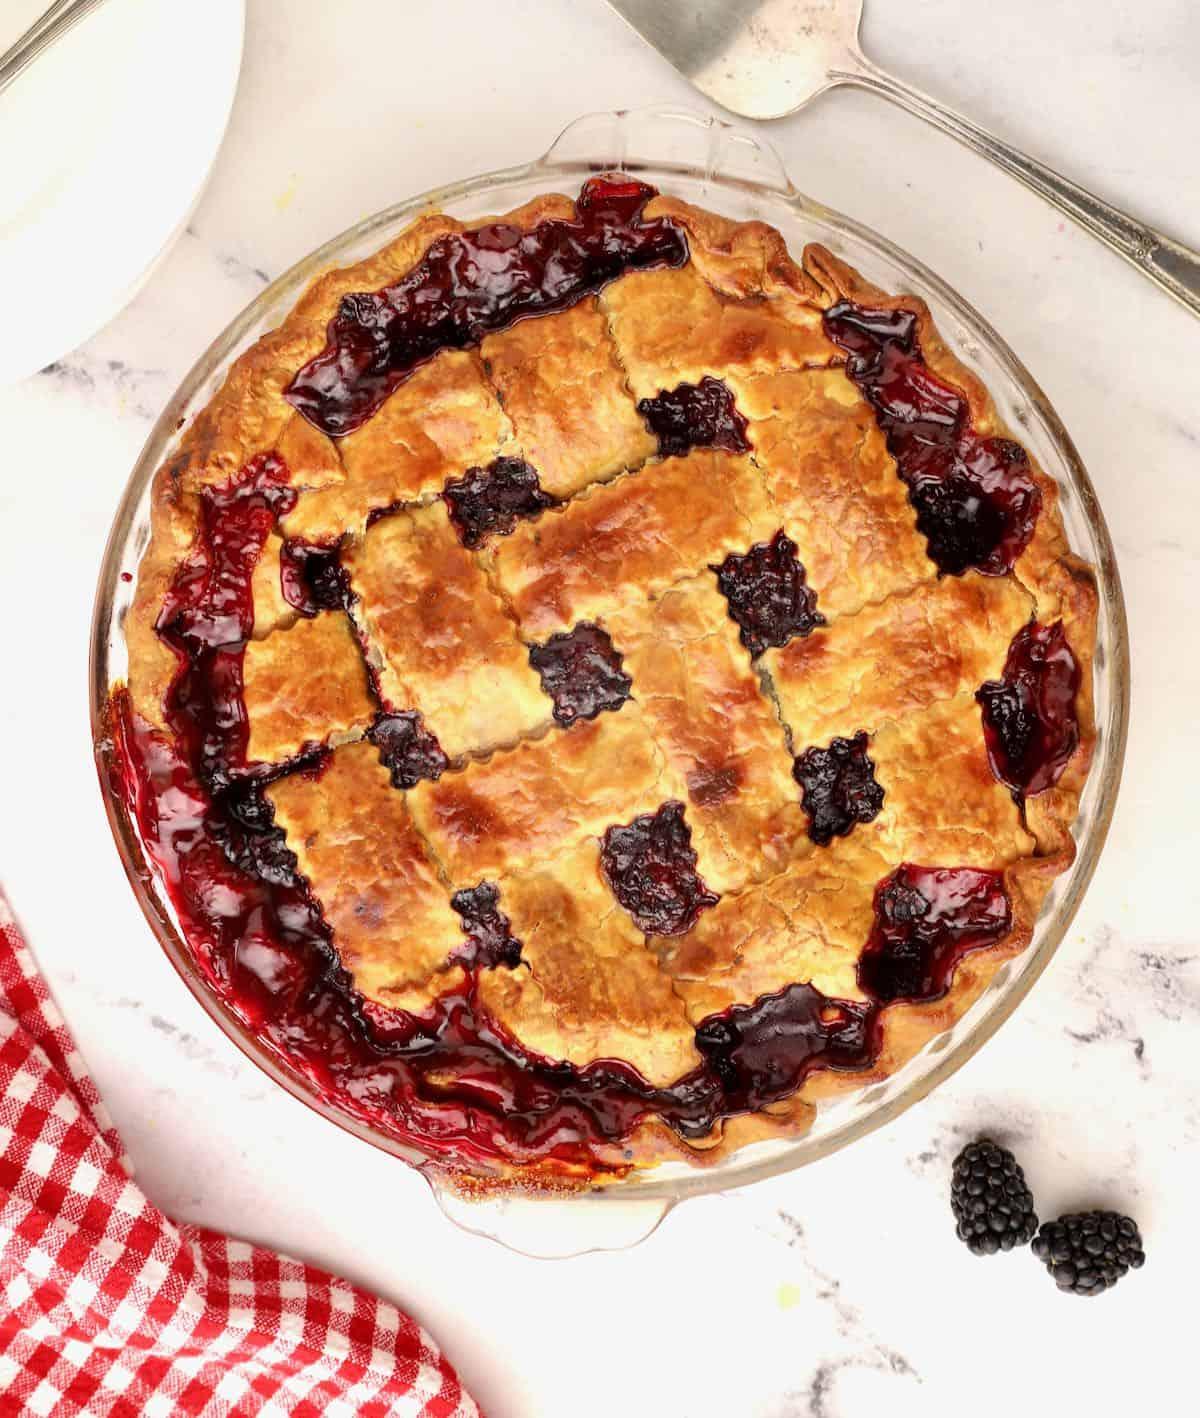 A baked blackberry pie.